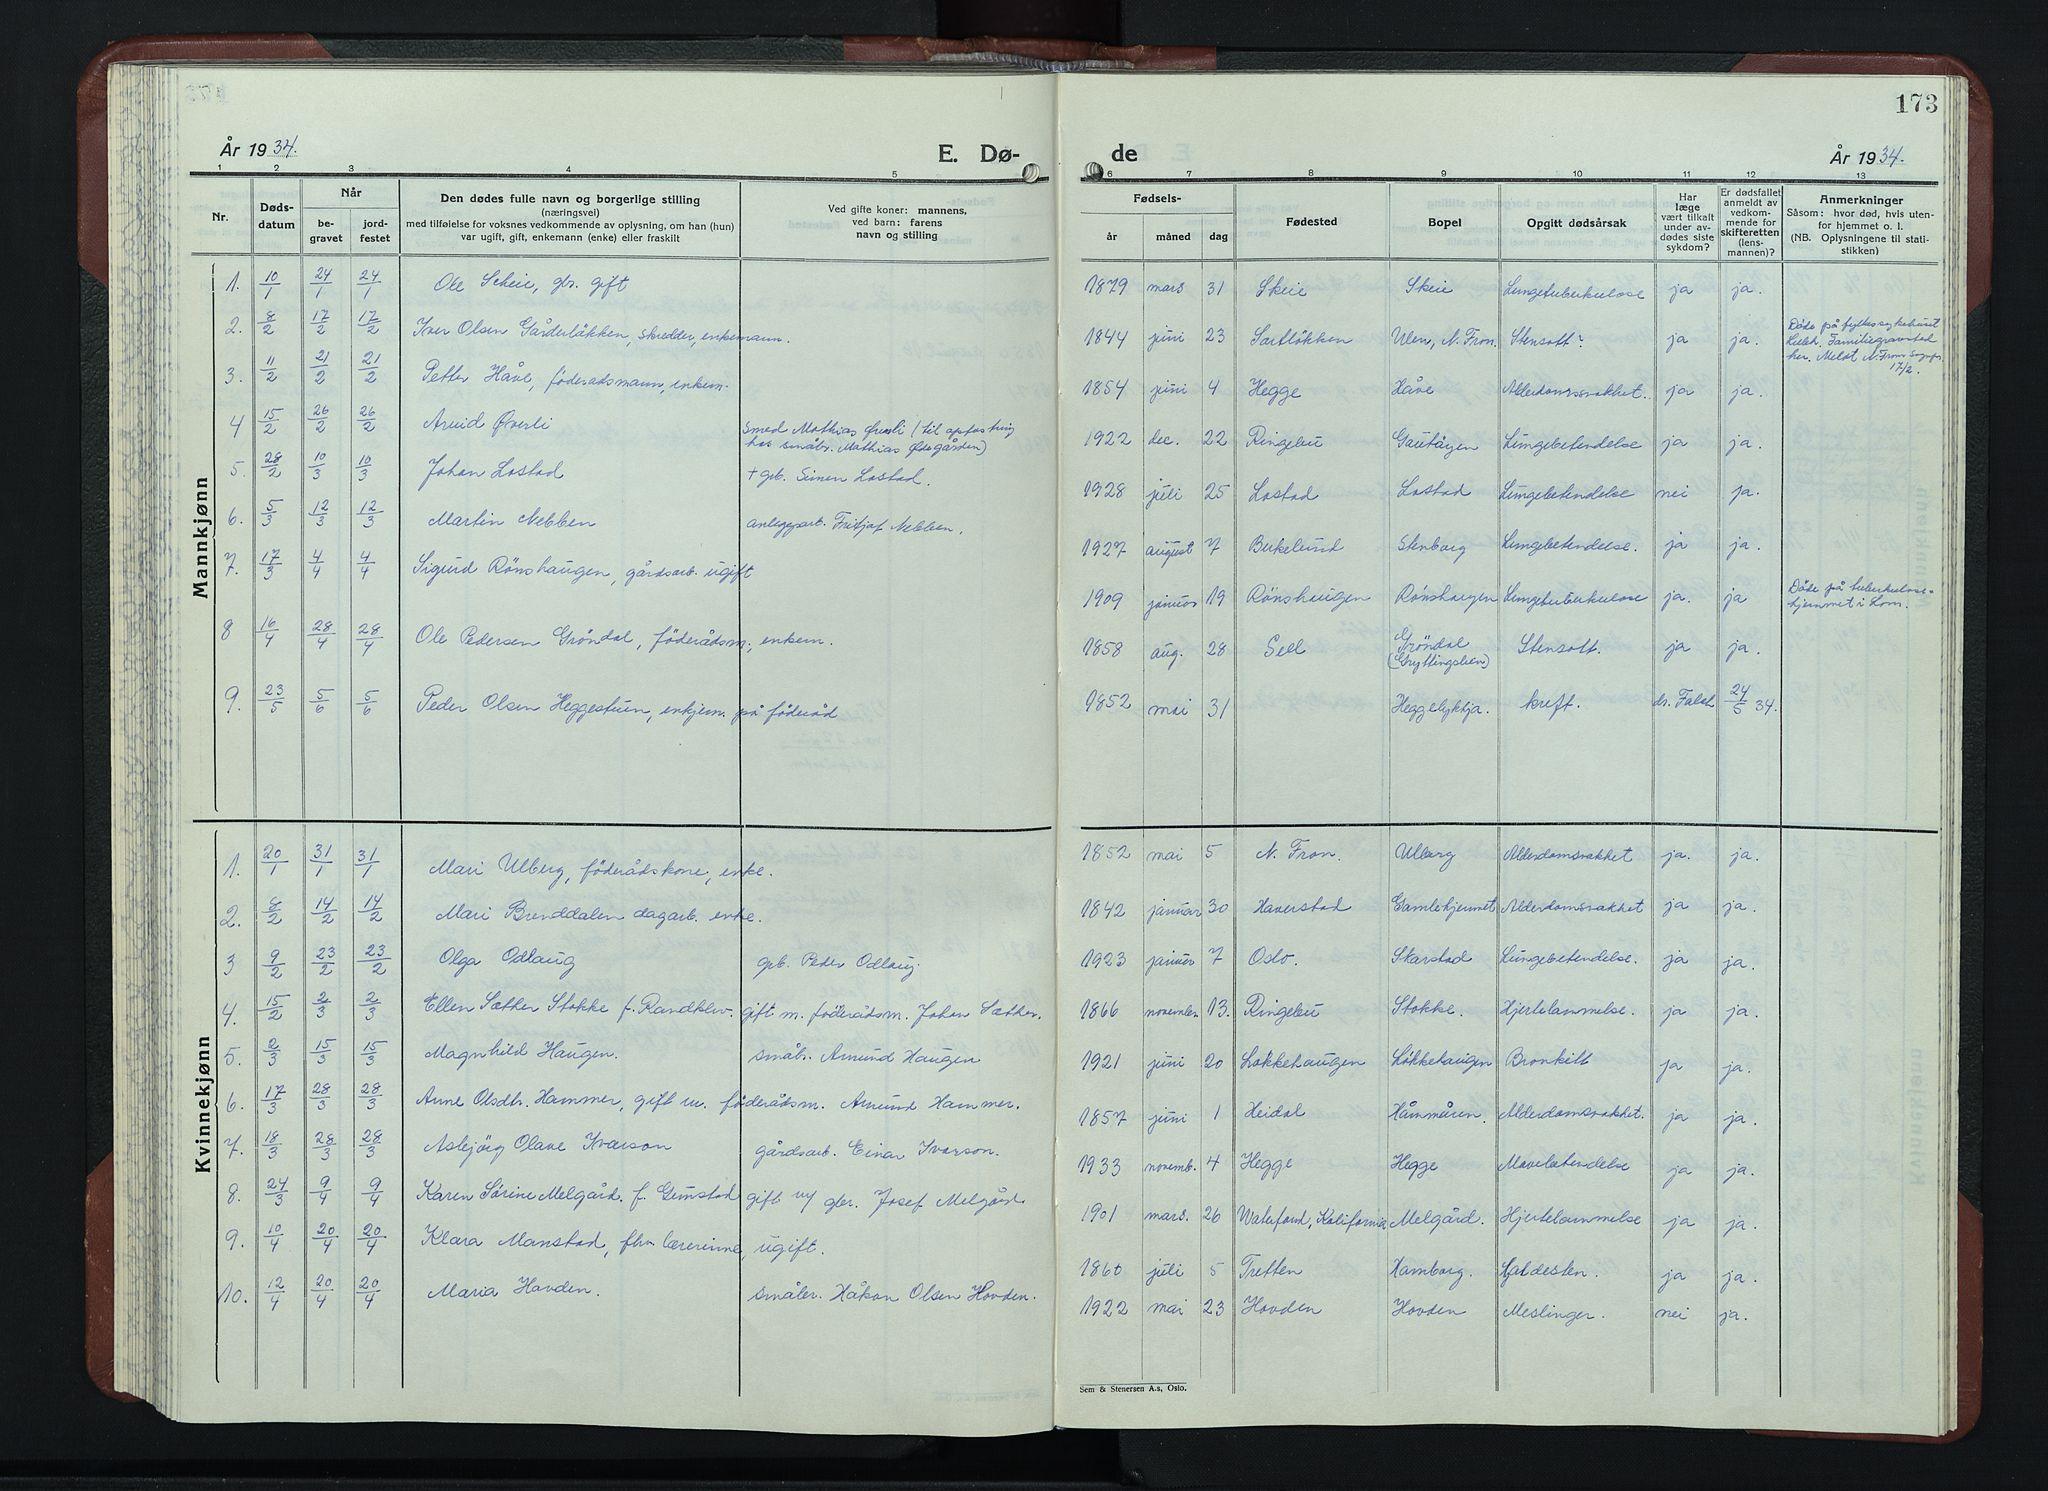 SAH, Sør-Fron prestekontor, H/Ha/Hab/L0006: Klokkerbok nr. 6, 1933-1948, s. 173